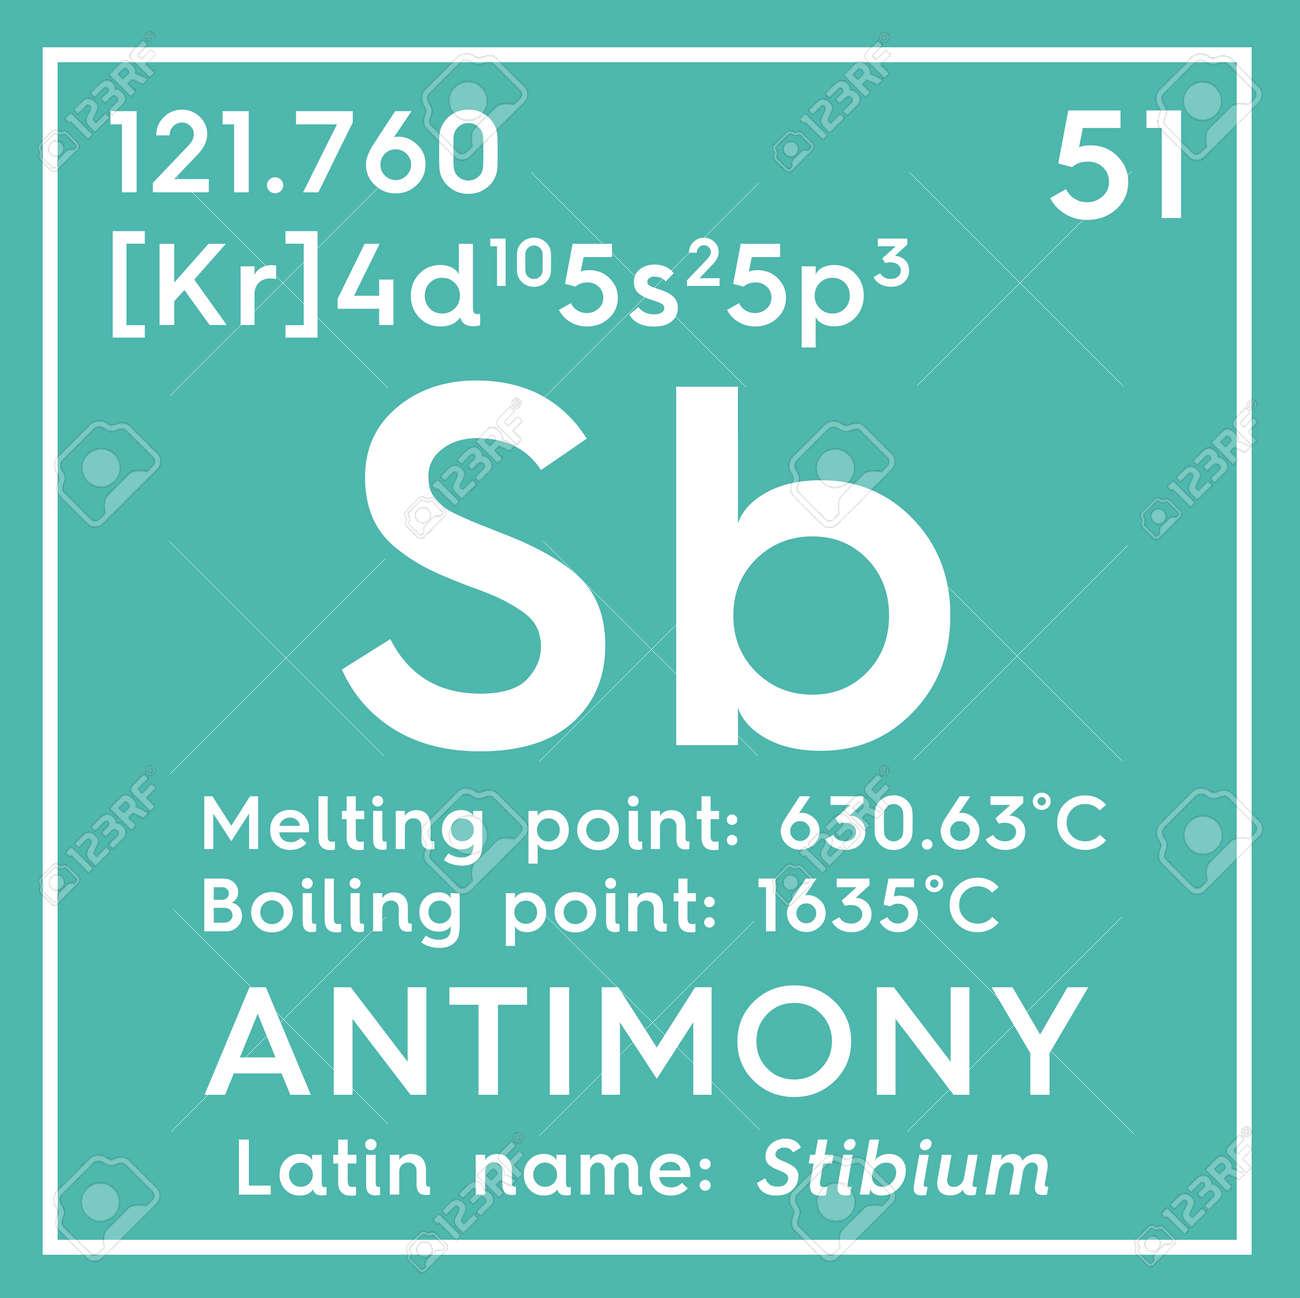 Antimony stibium metalloids chemical element of mendeleevs antimony stibium metalloids chemical element of mendeleevs periodic table antimony in a gamestrikefo Choice Image